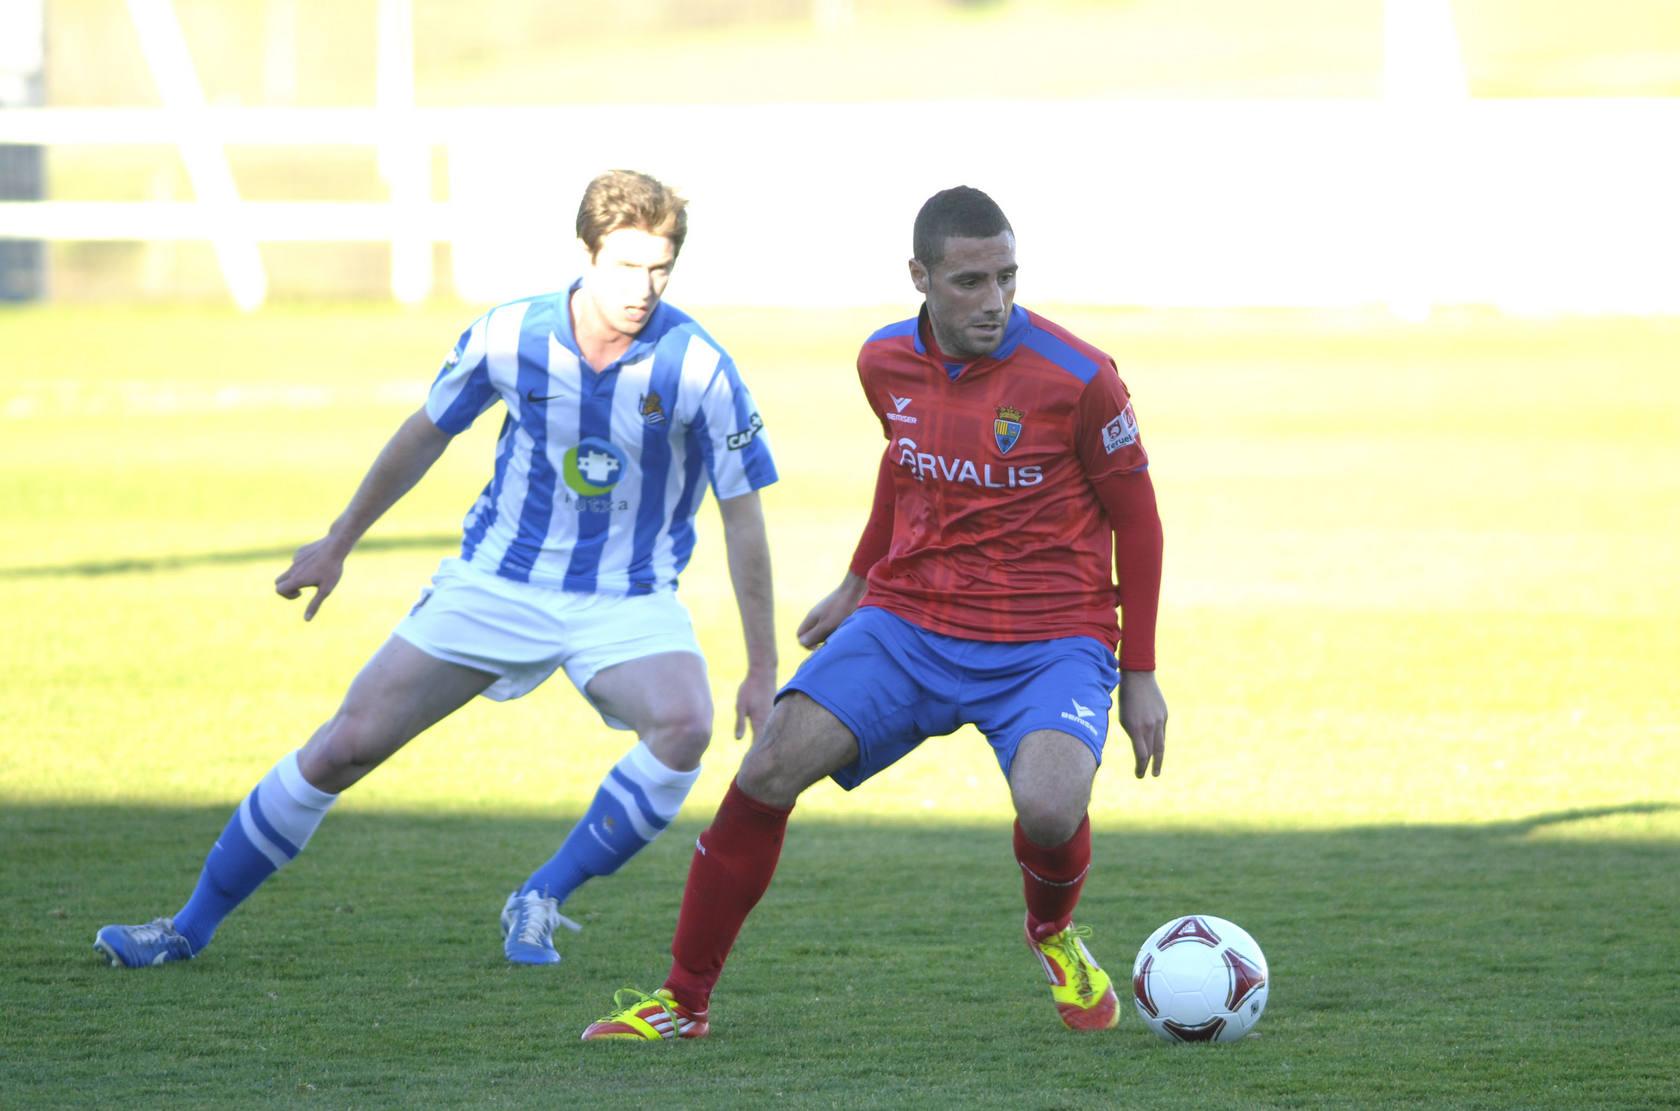 Sanse 1 - Teruel 3